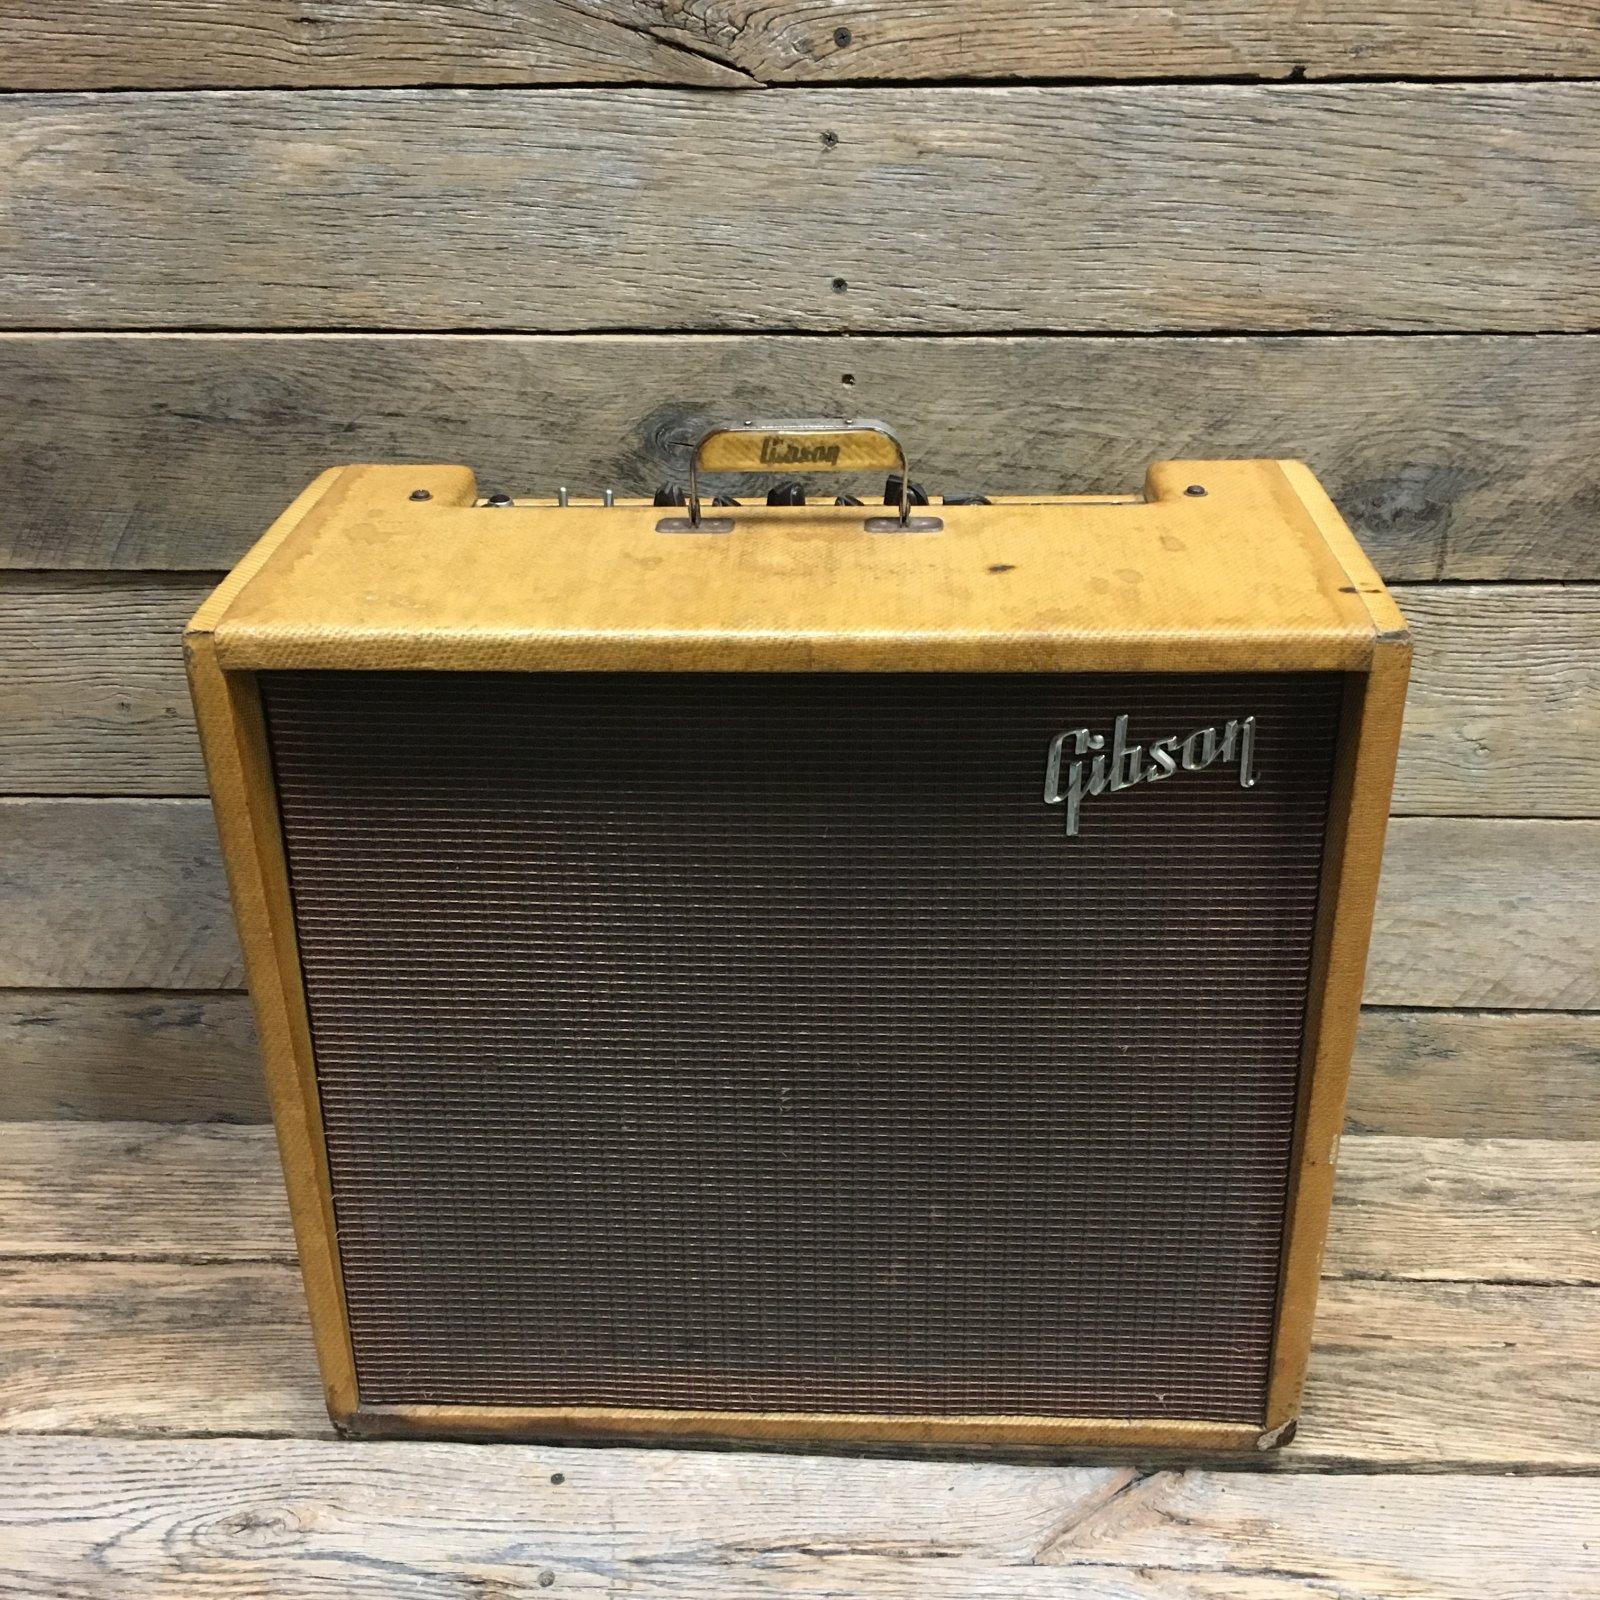 Used Gibson 1960 GA77 Vanguard